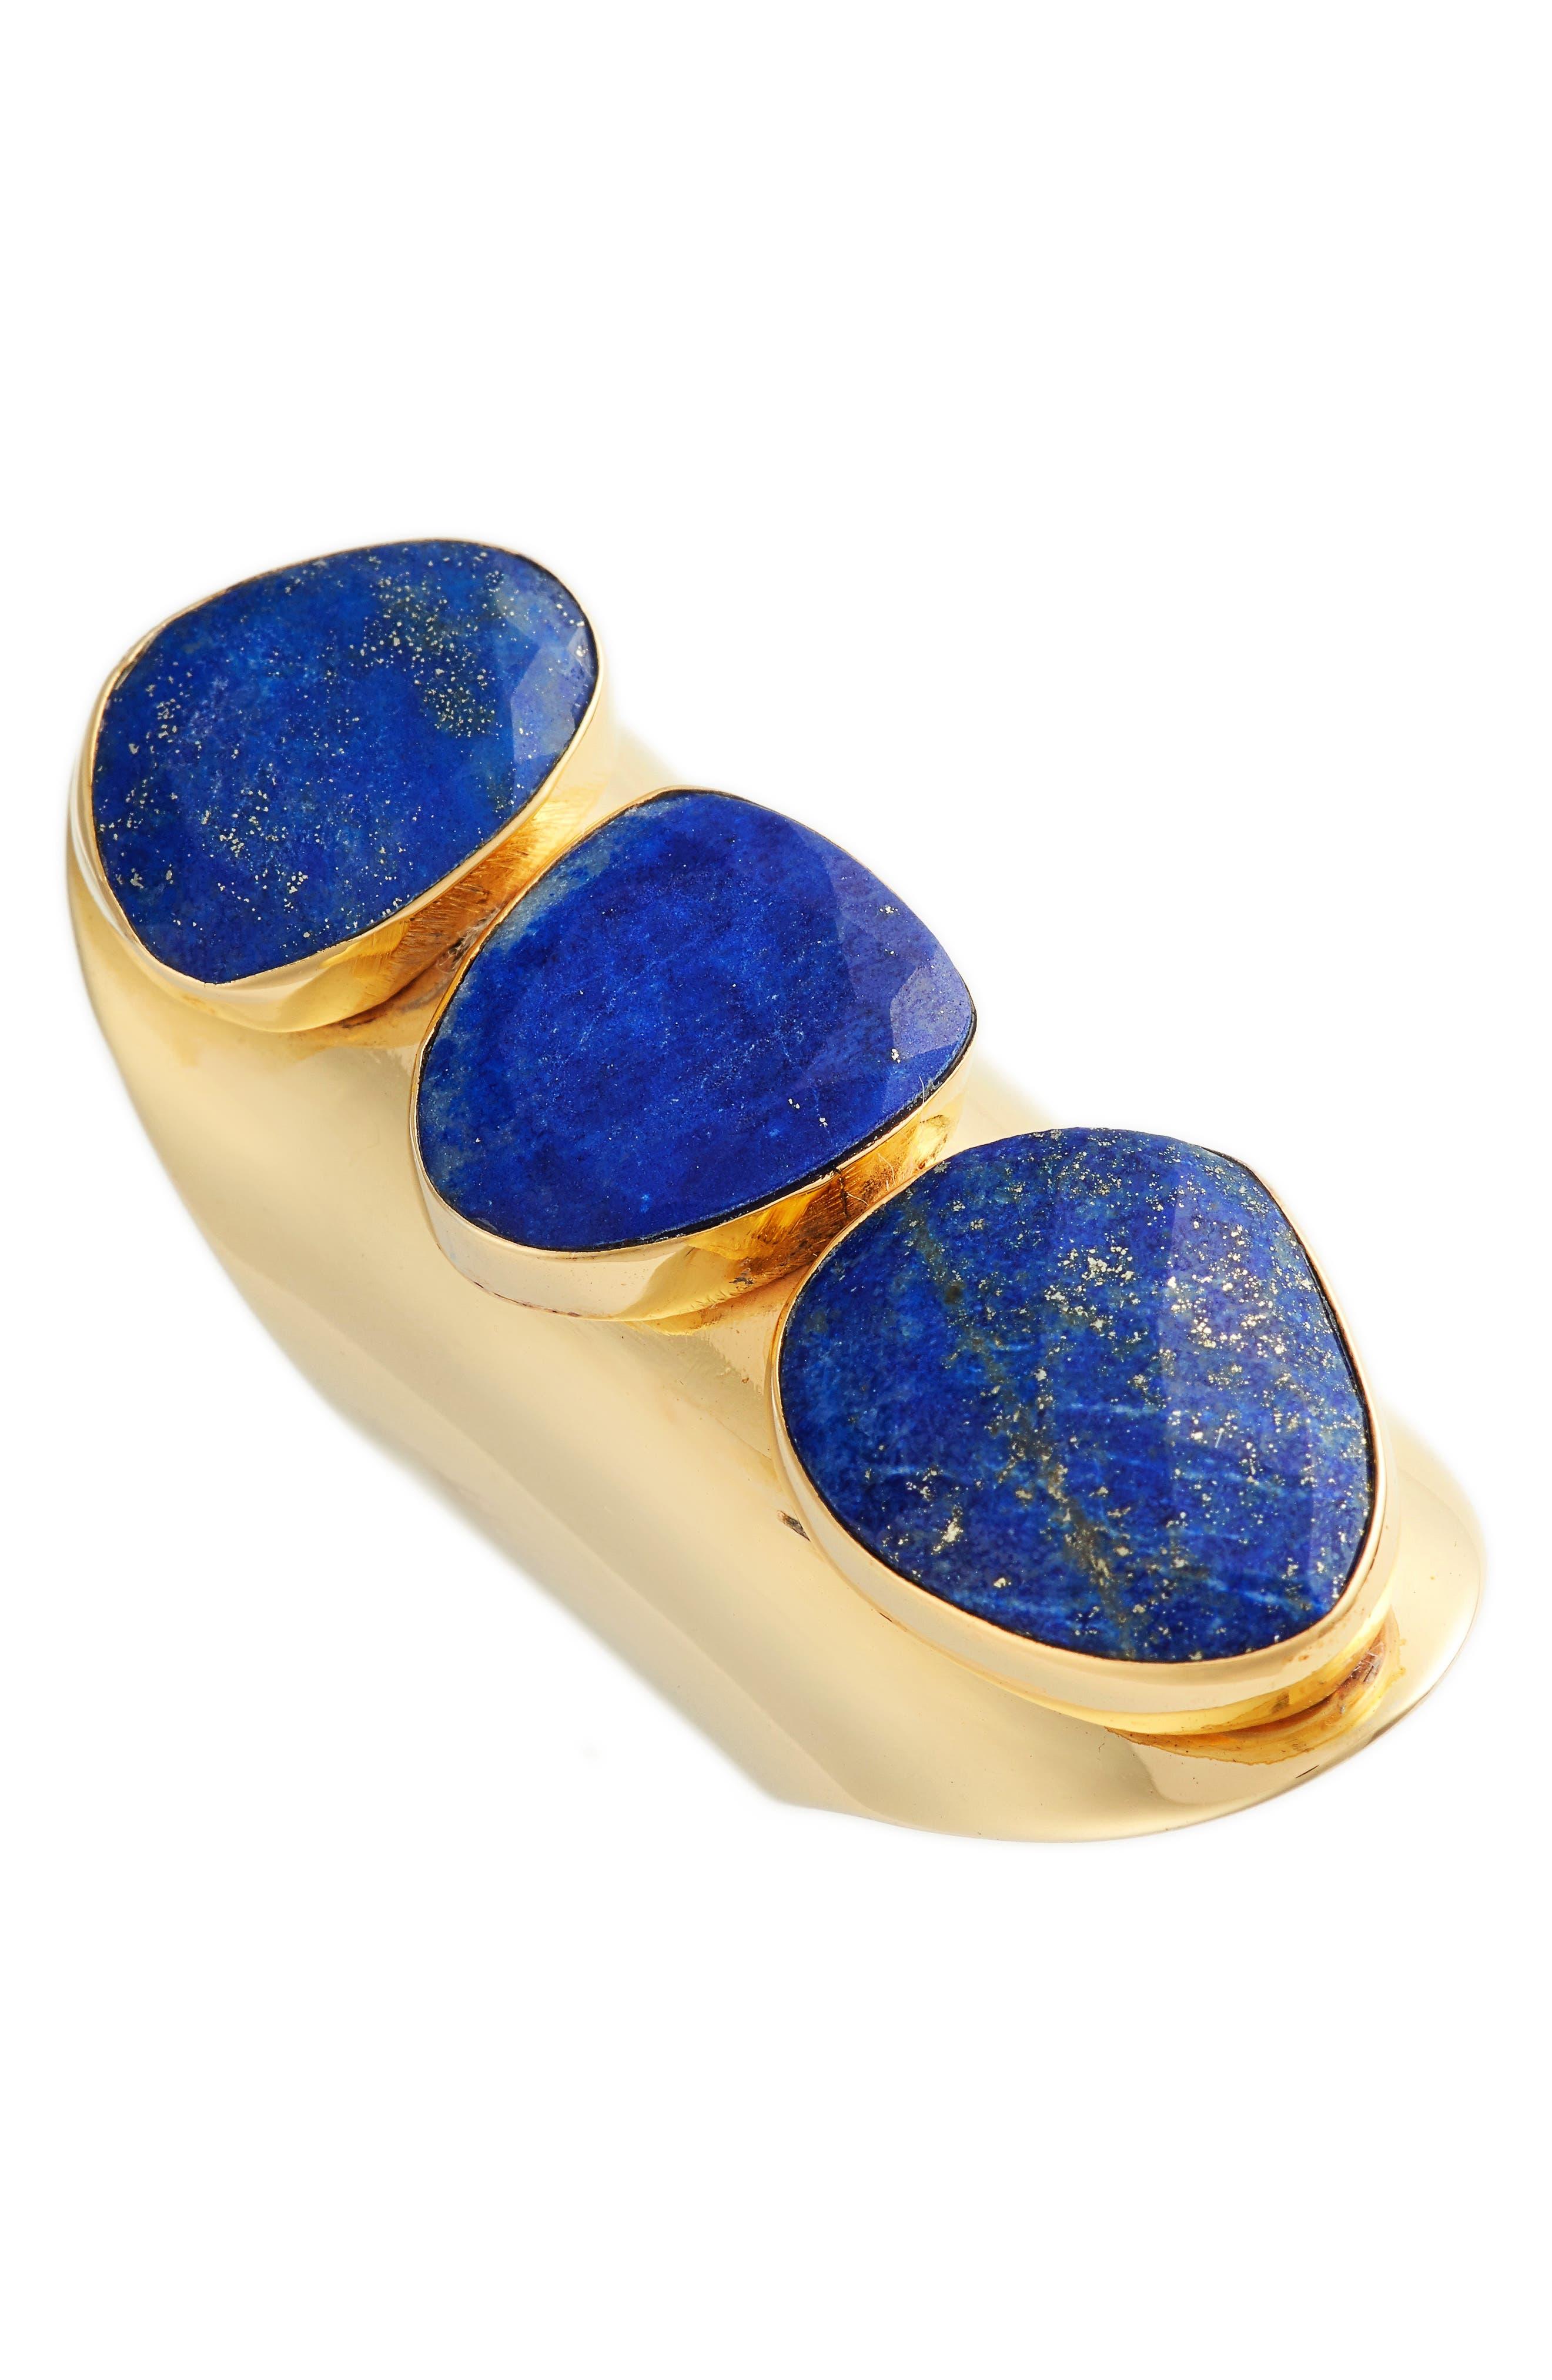 Main Image - Nakamol Design Anas 3 Stone Lapis Ring